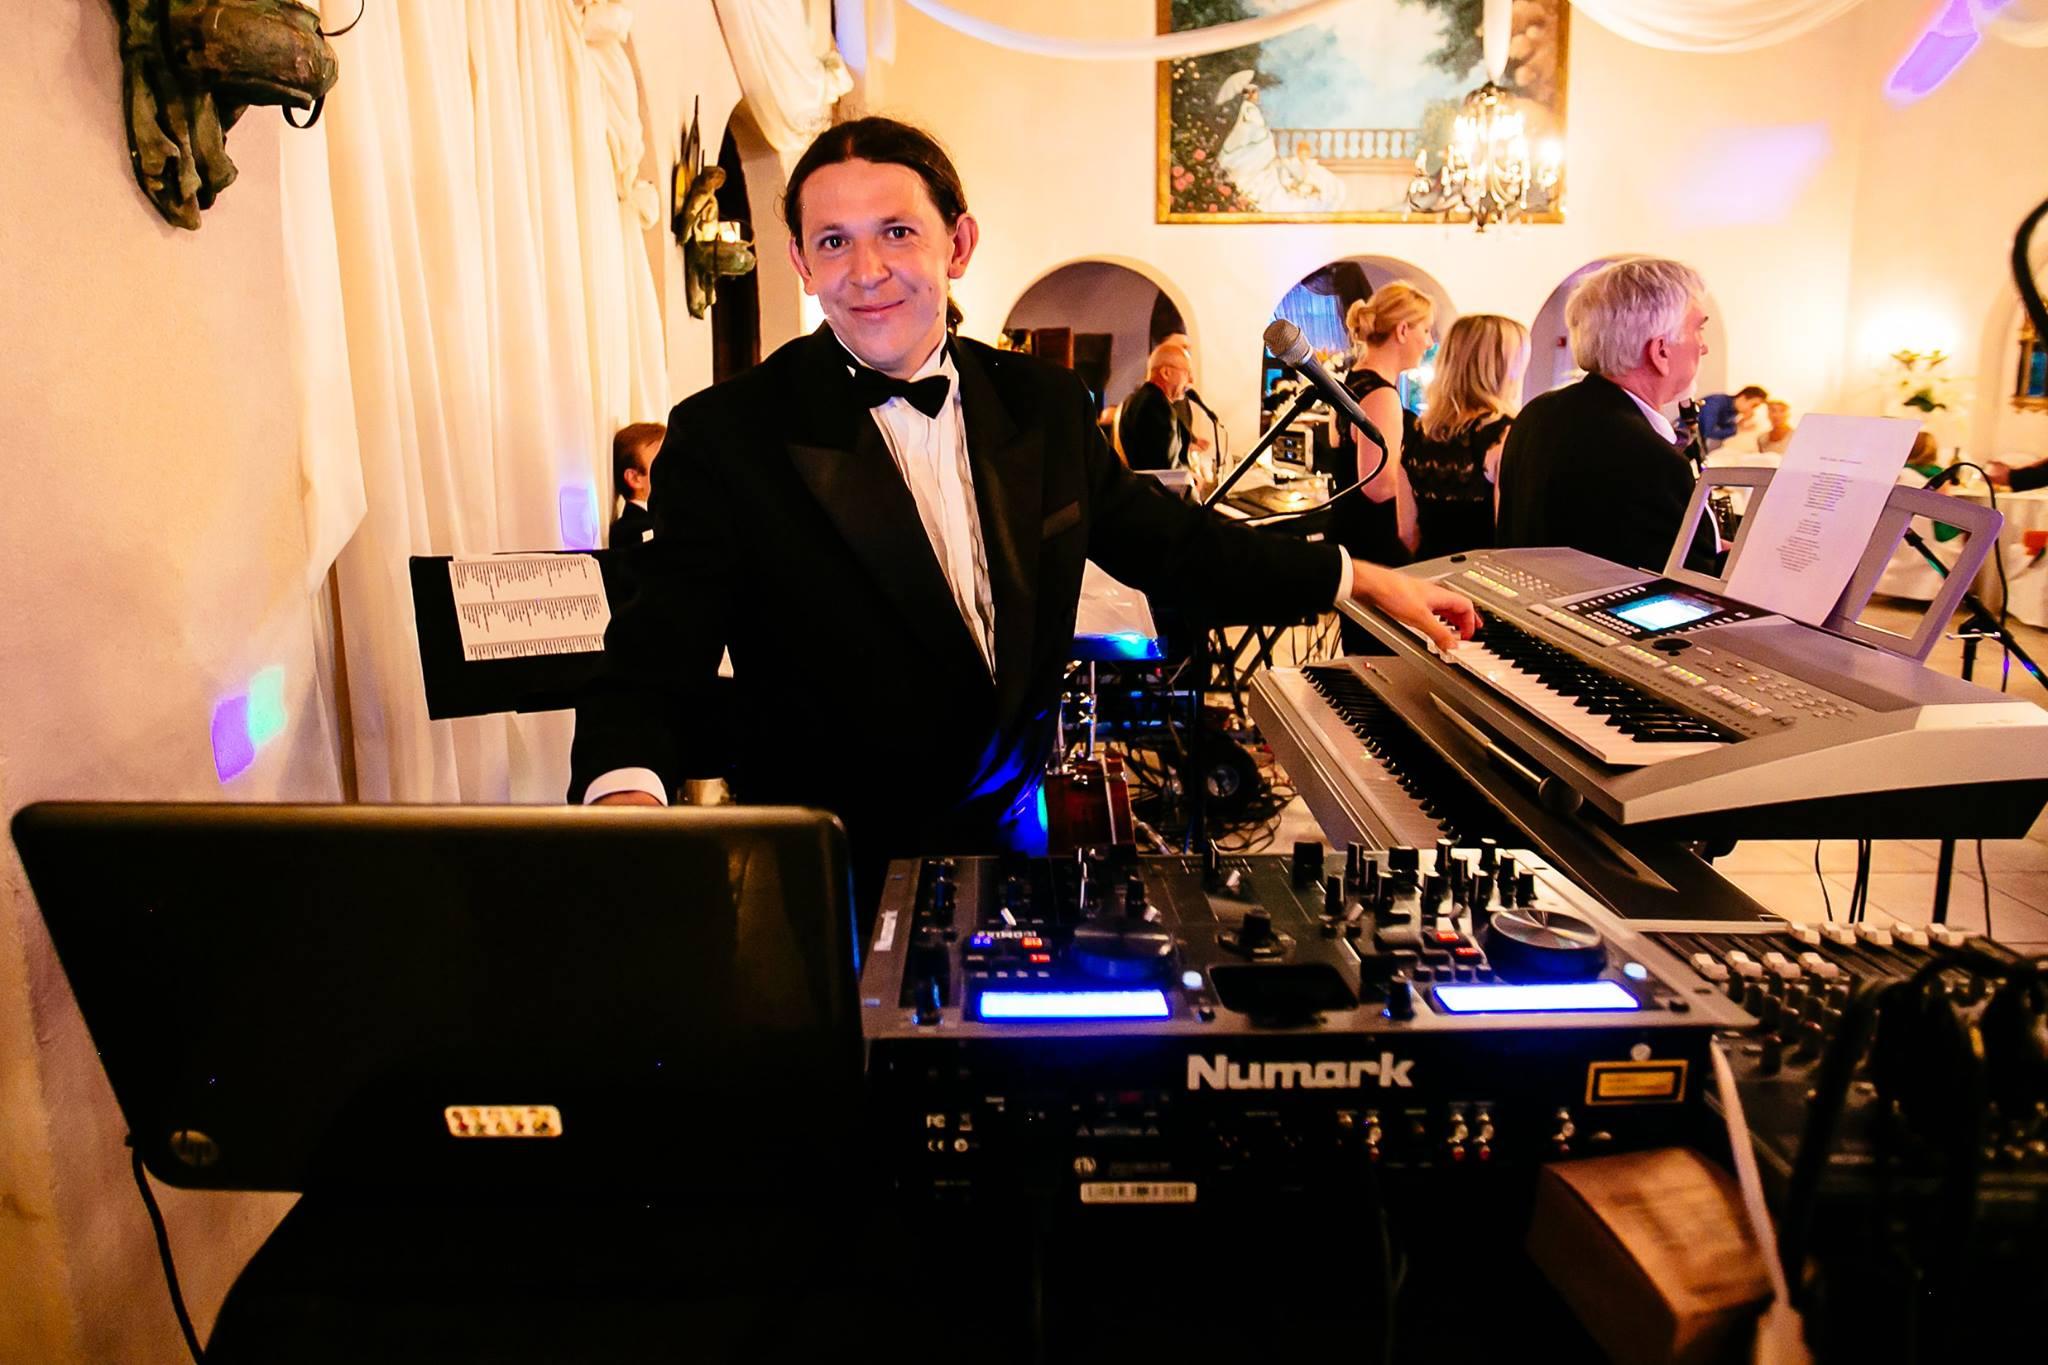 Polski DJ na wesele w NY, NJ, PA i CT - DJ Halat